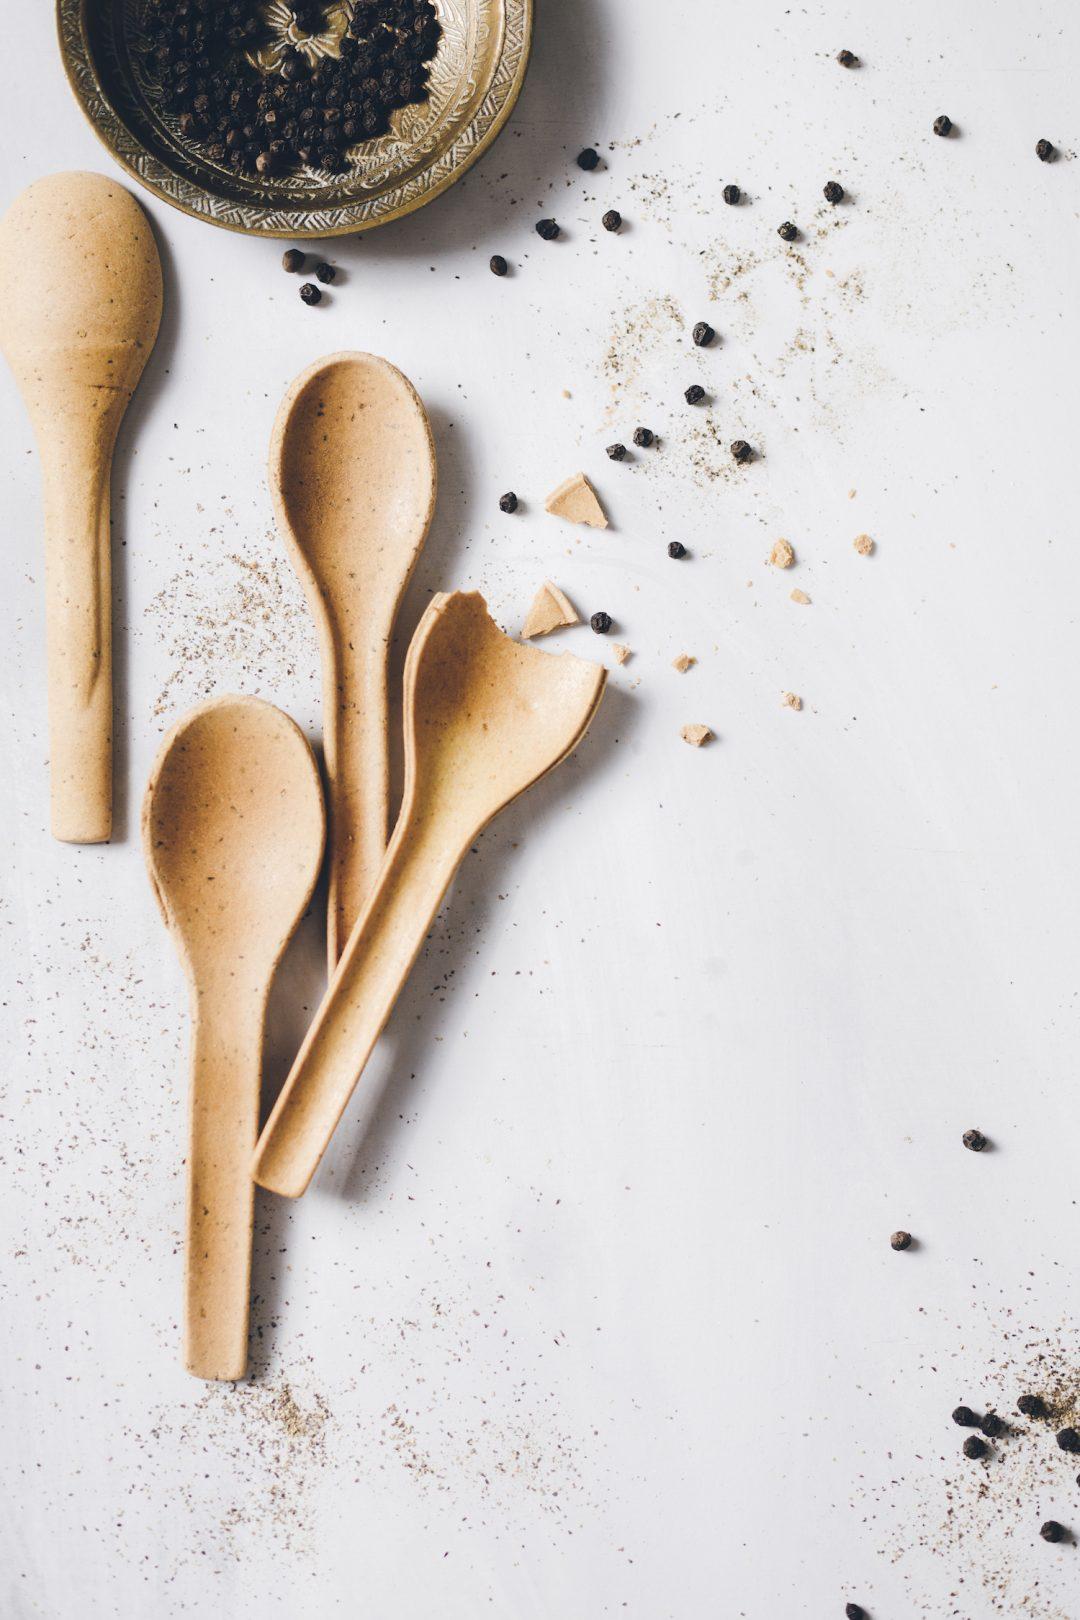 incrEDIBLE spoons